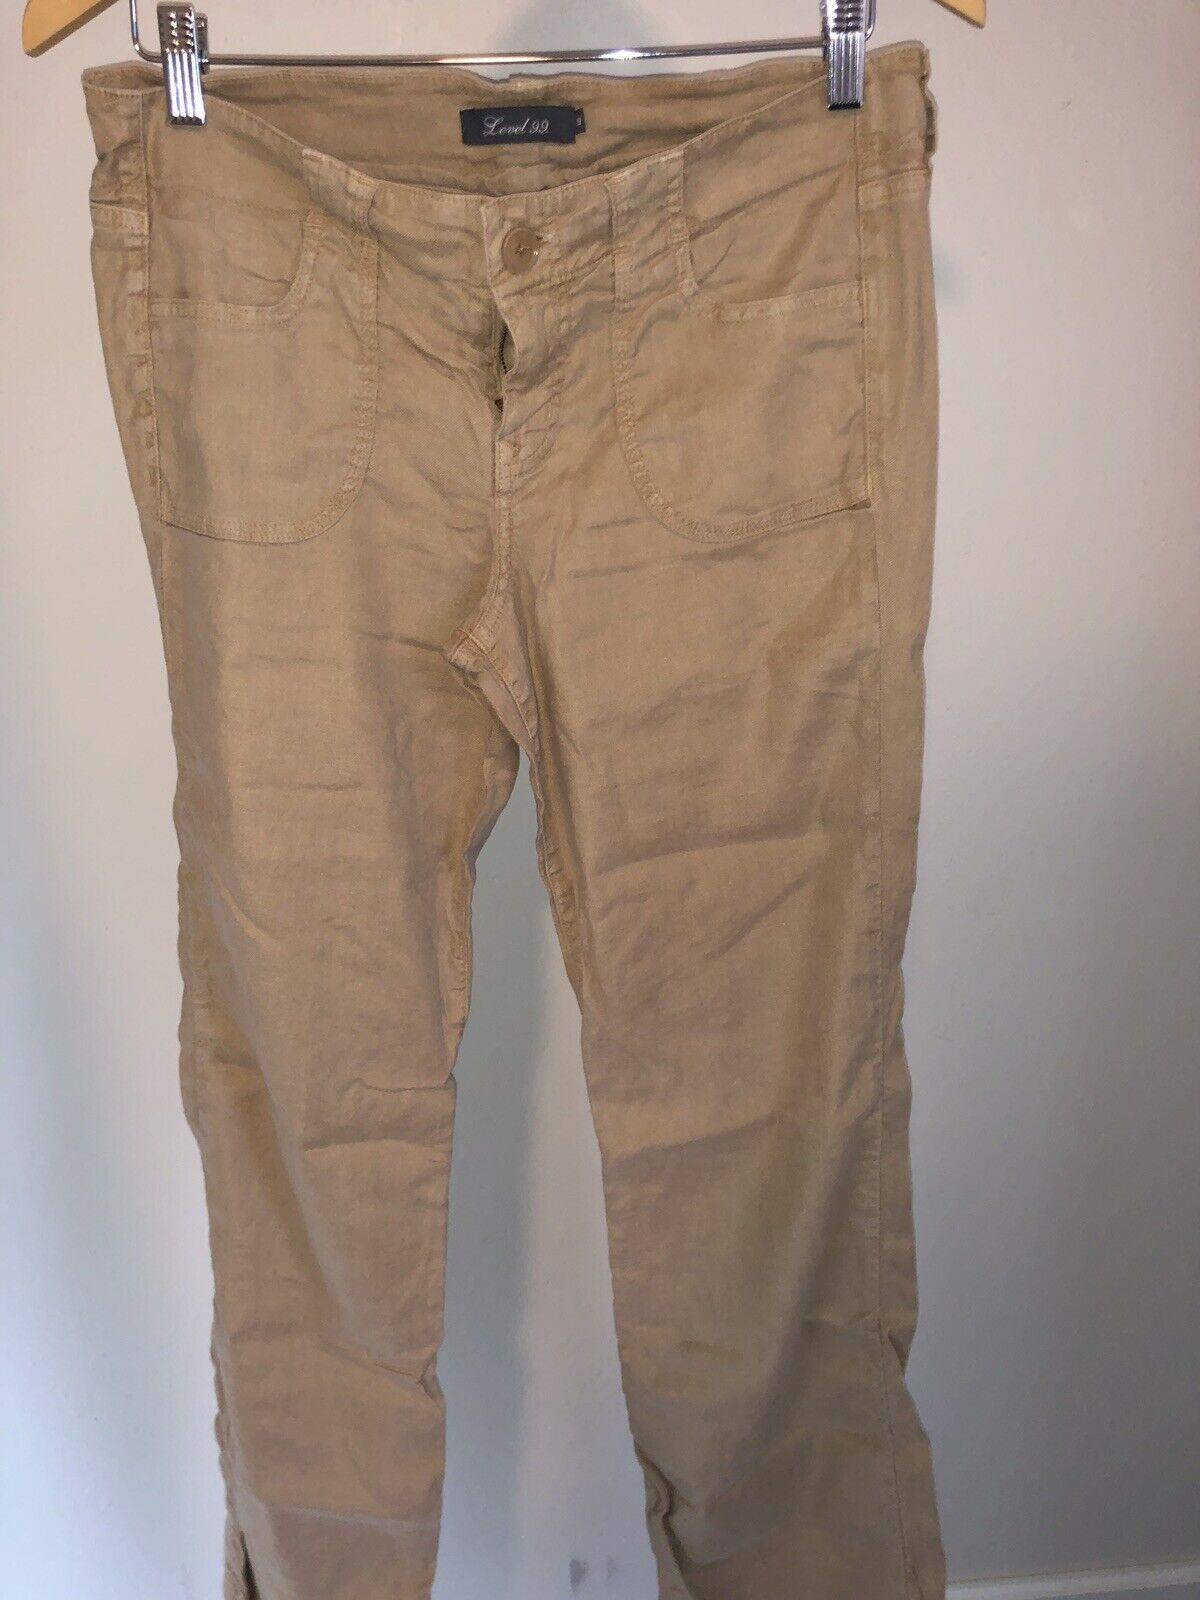 Level 99 Frankie Linen Blend Wide Leg Pant, Size 29 - Orig.  105